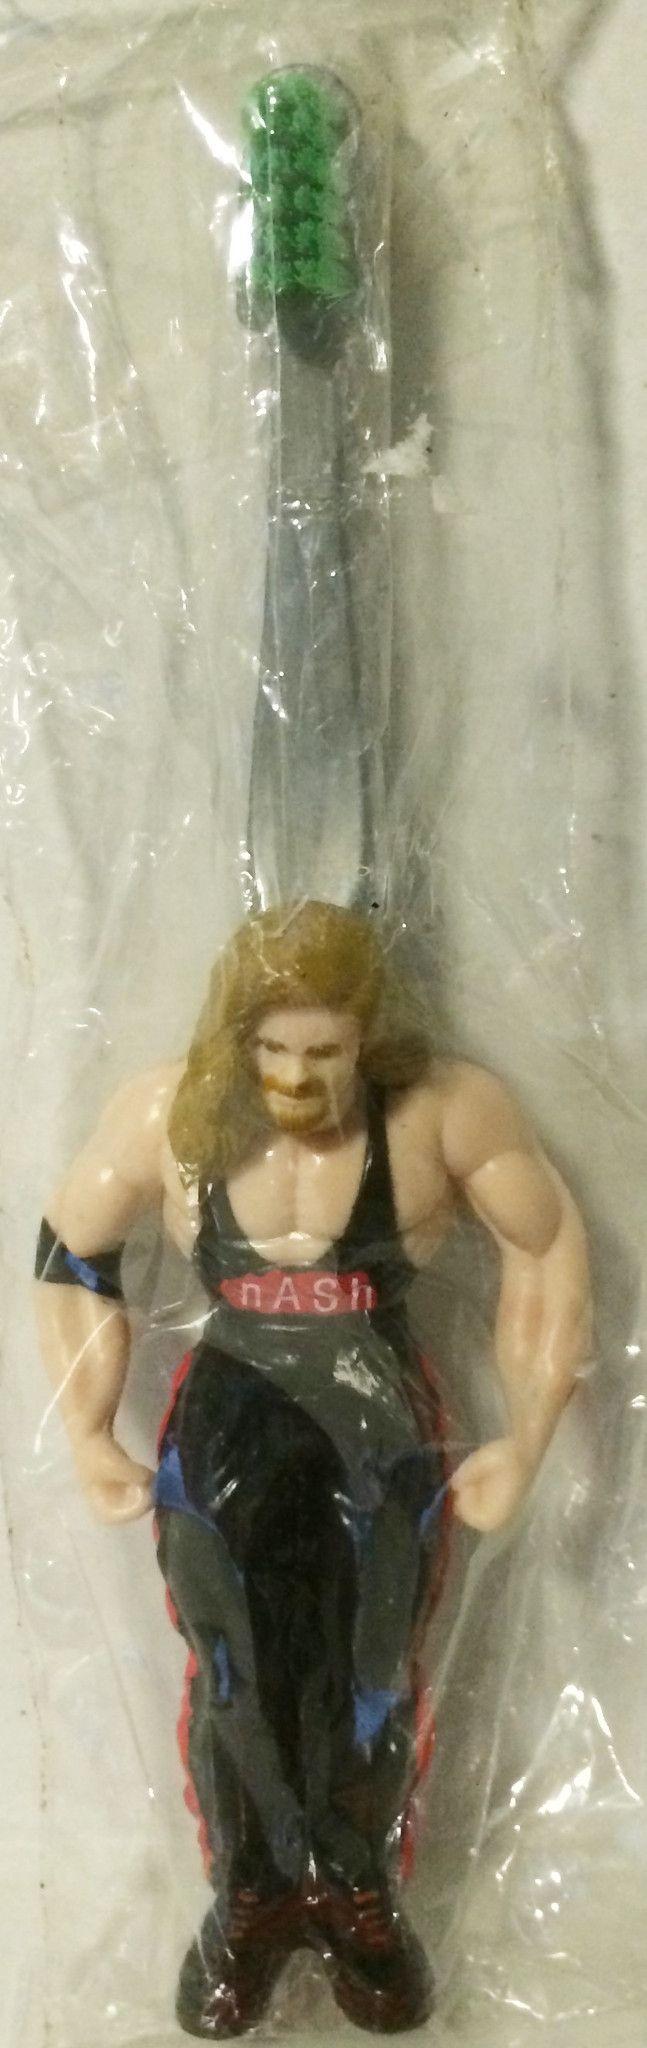 (TAS032248) - 1999 WCW Wrestling Toothbrush Green Bristles - Kevin Nash